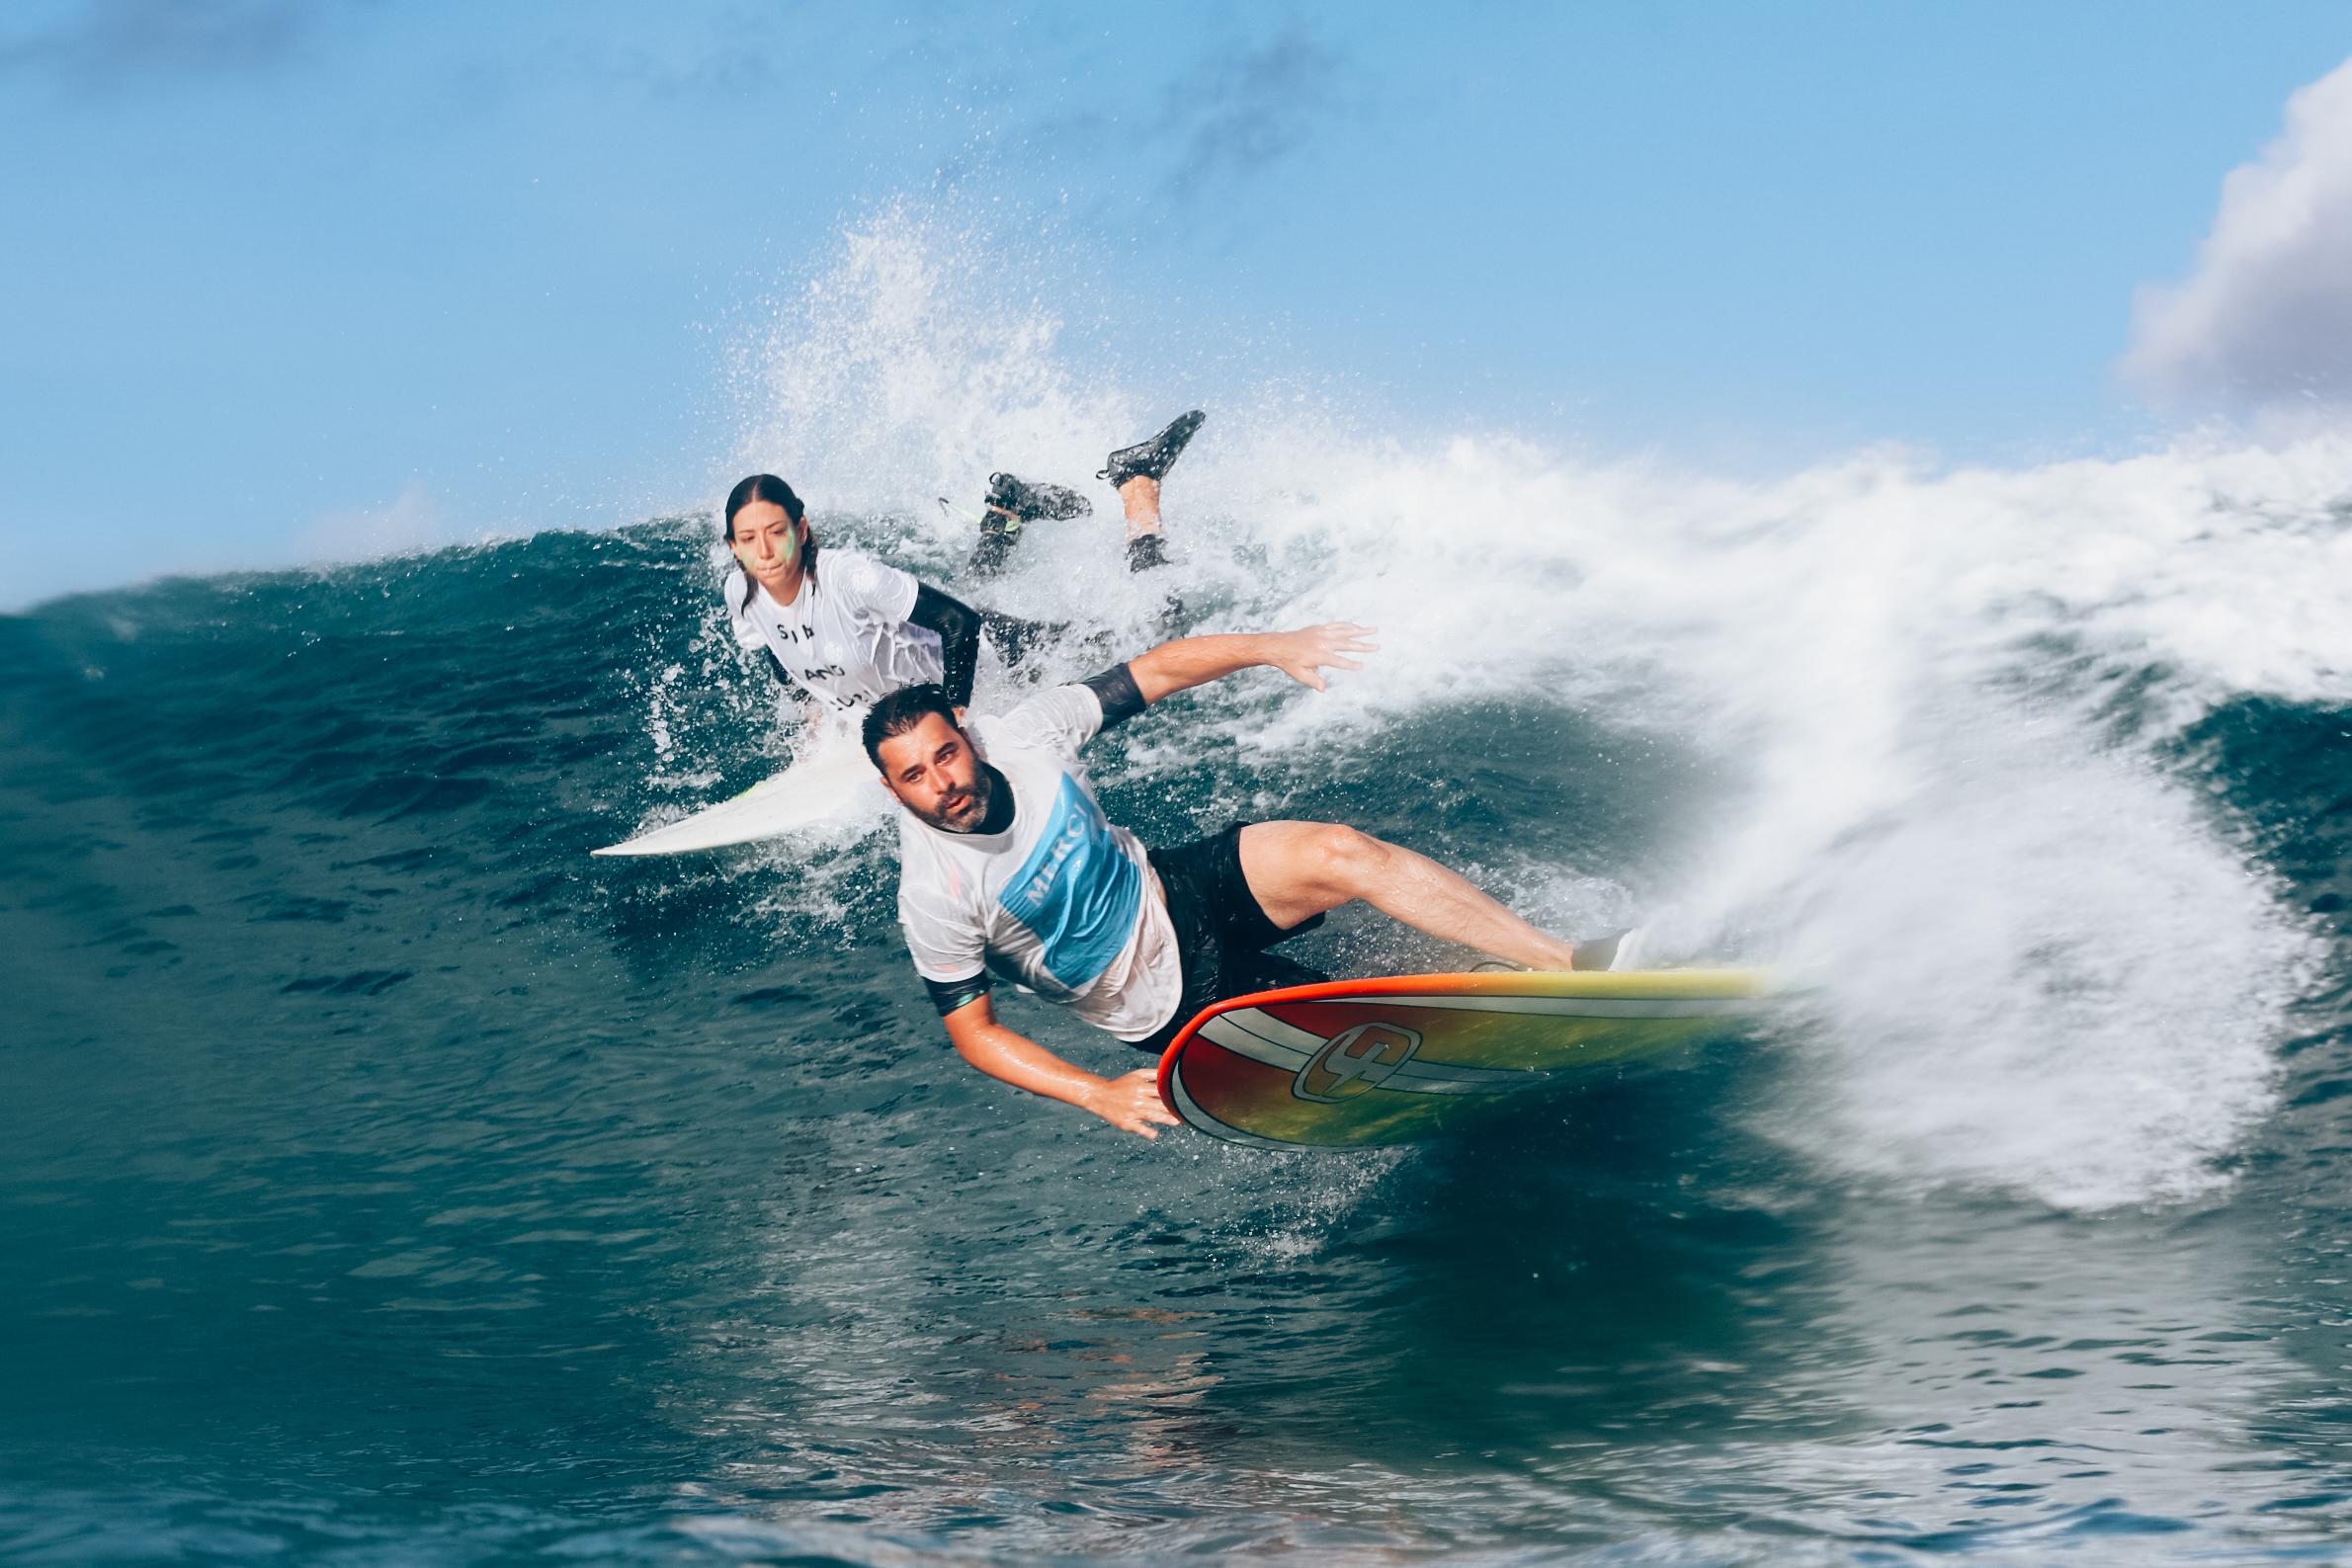 surf_day8-29.jpg